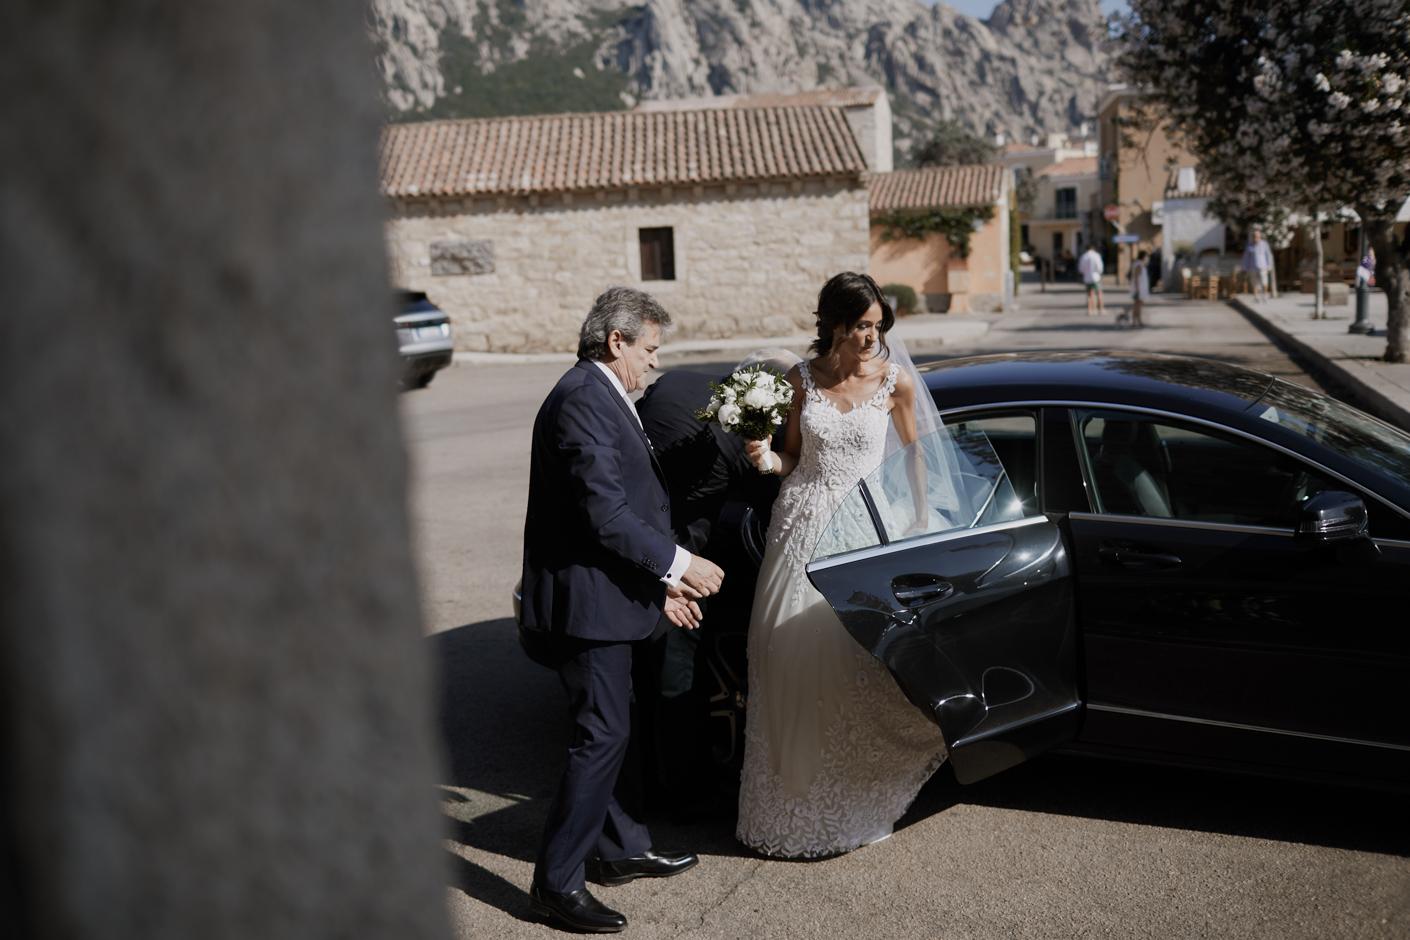 Francesca Floris fotografo matrimonio costa smeralda